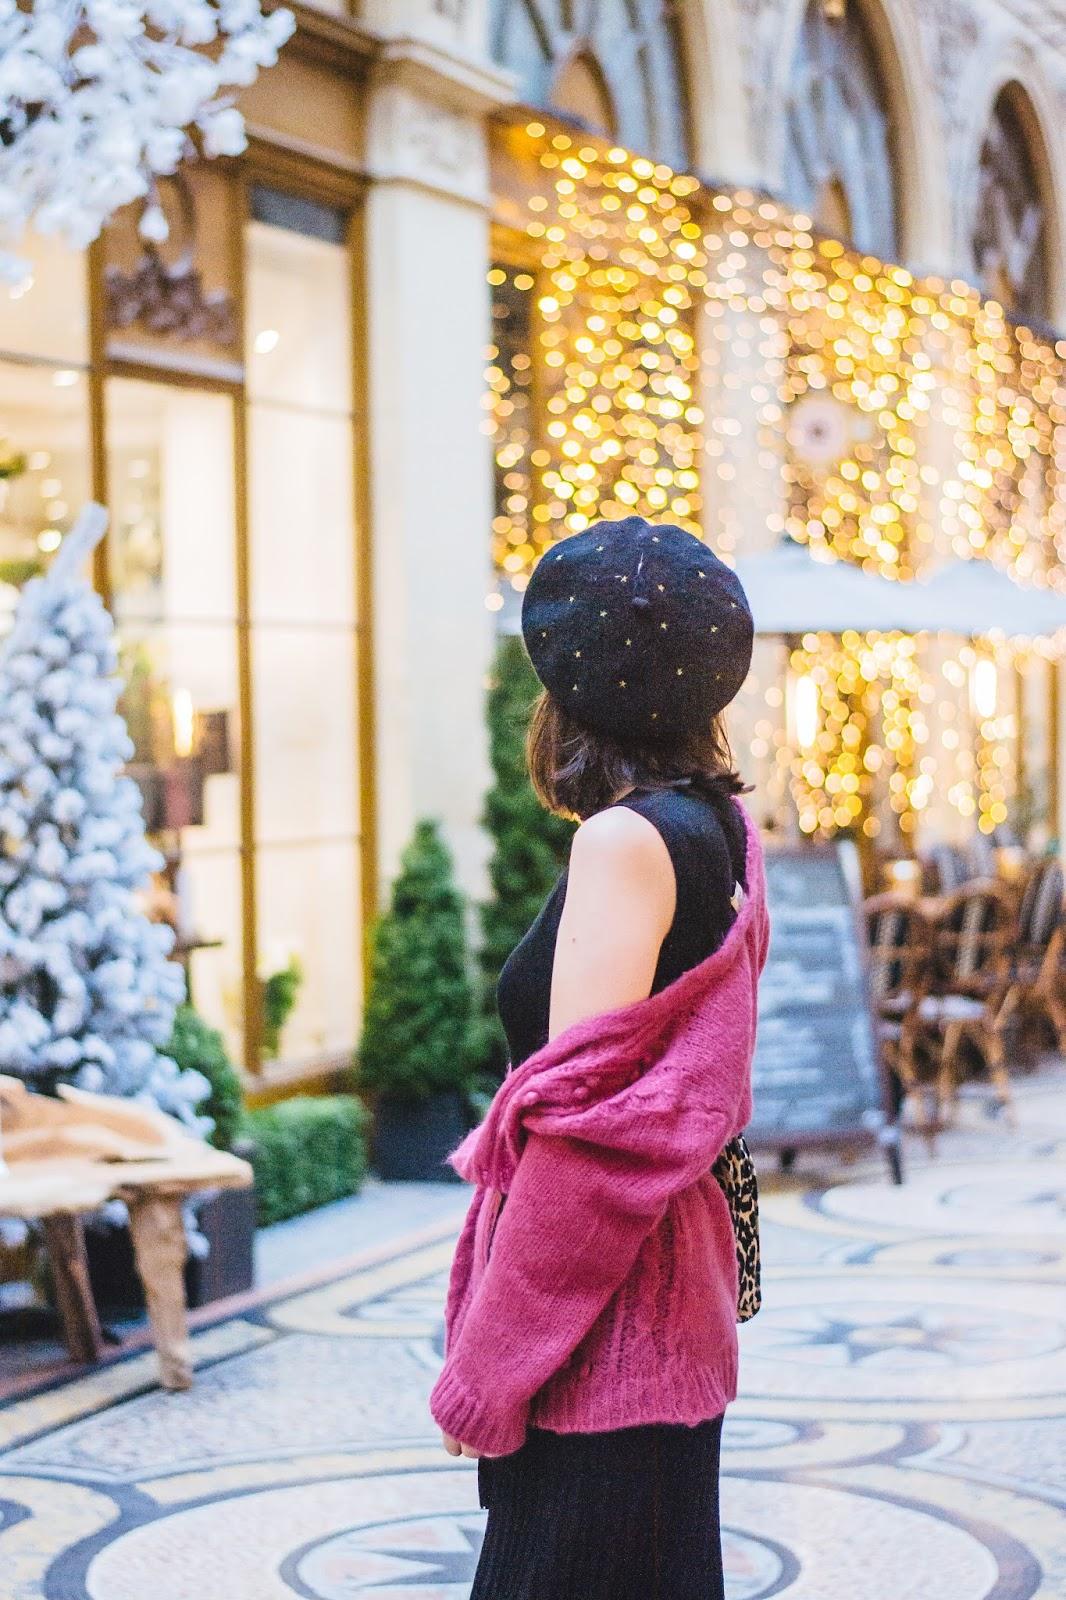 meetmeinparee-style-look-fashion-pairsianstyle-streetstyle-winterfashionideas